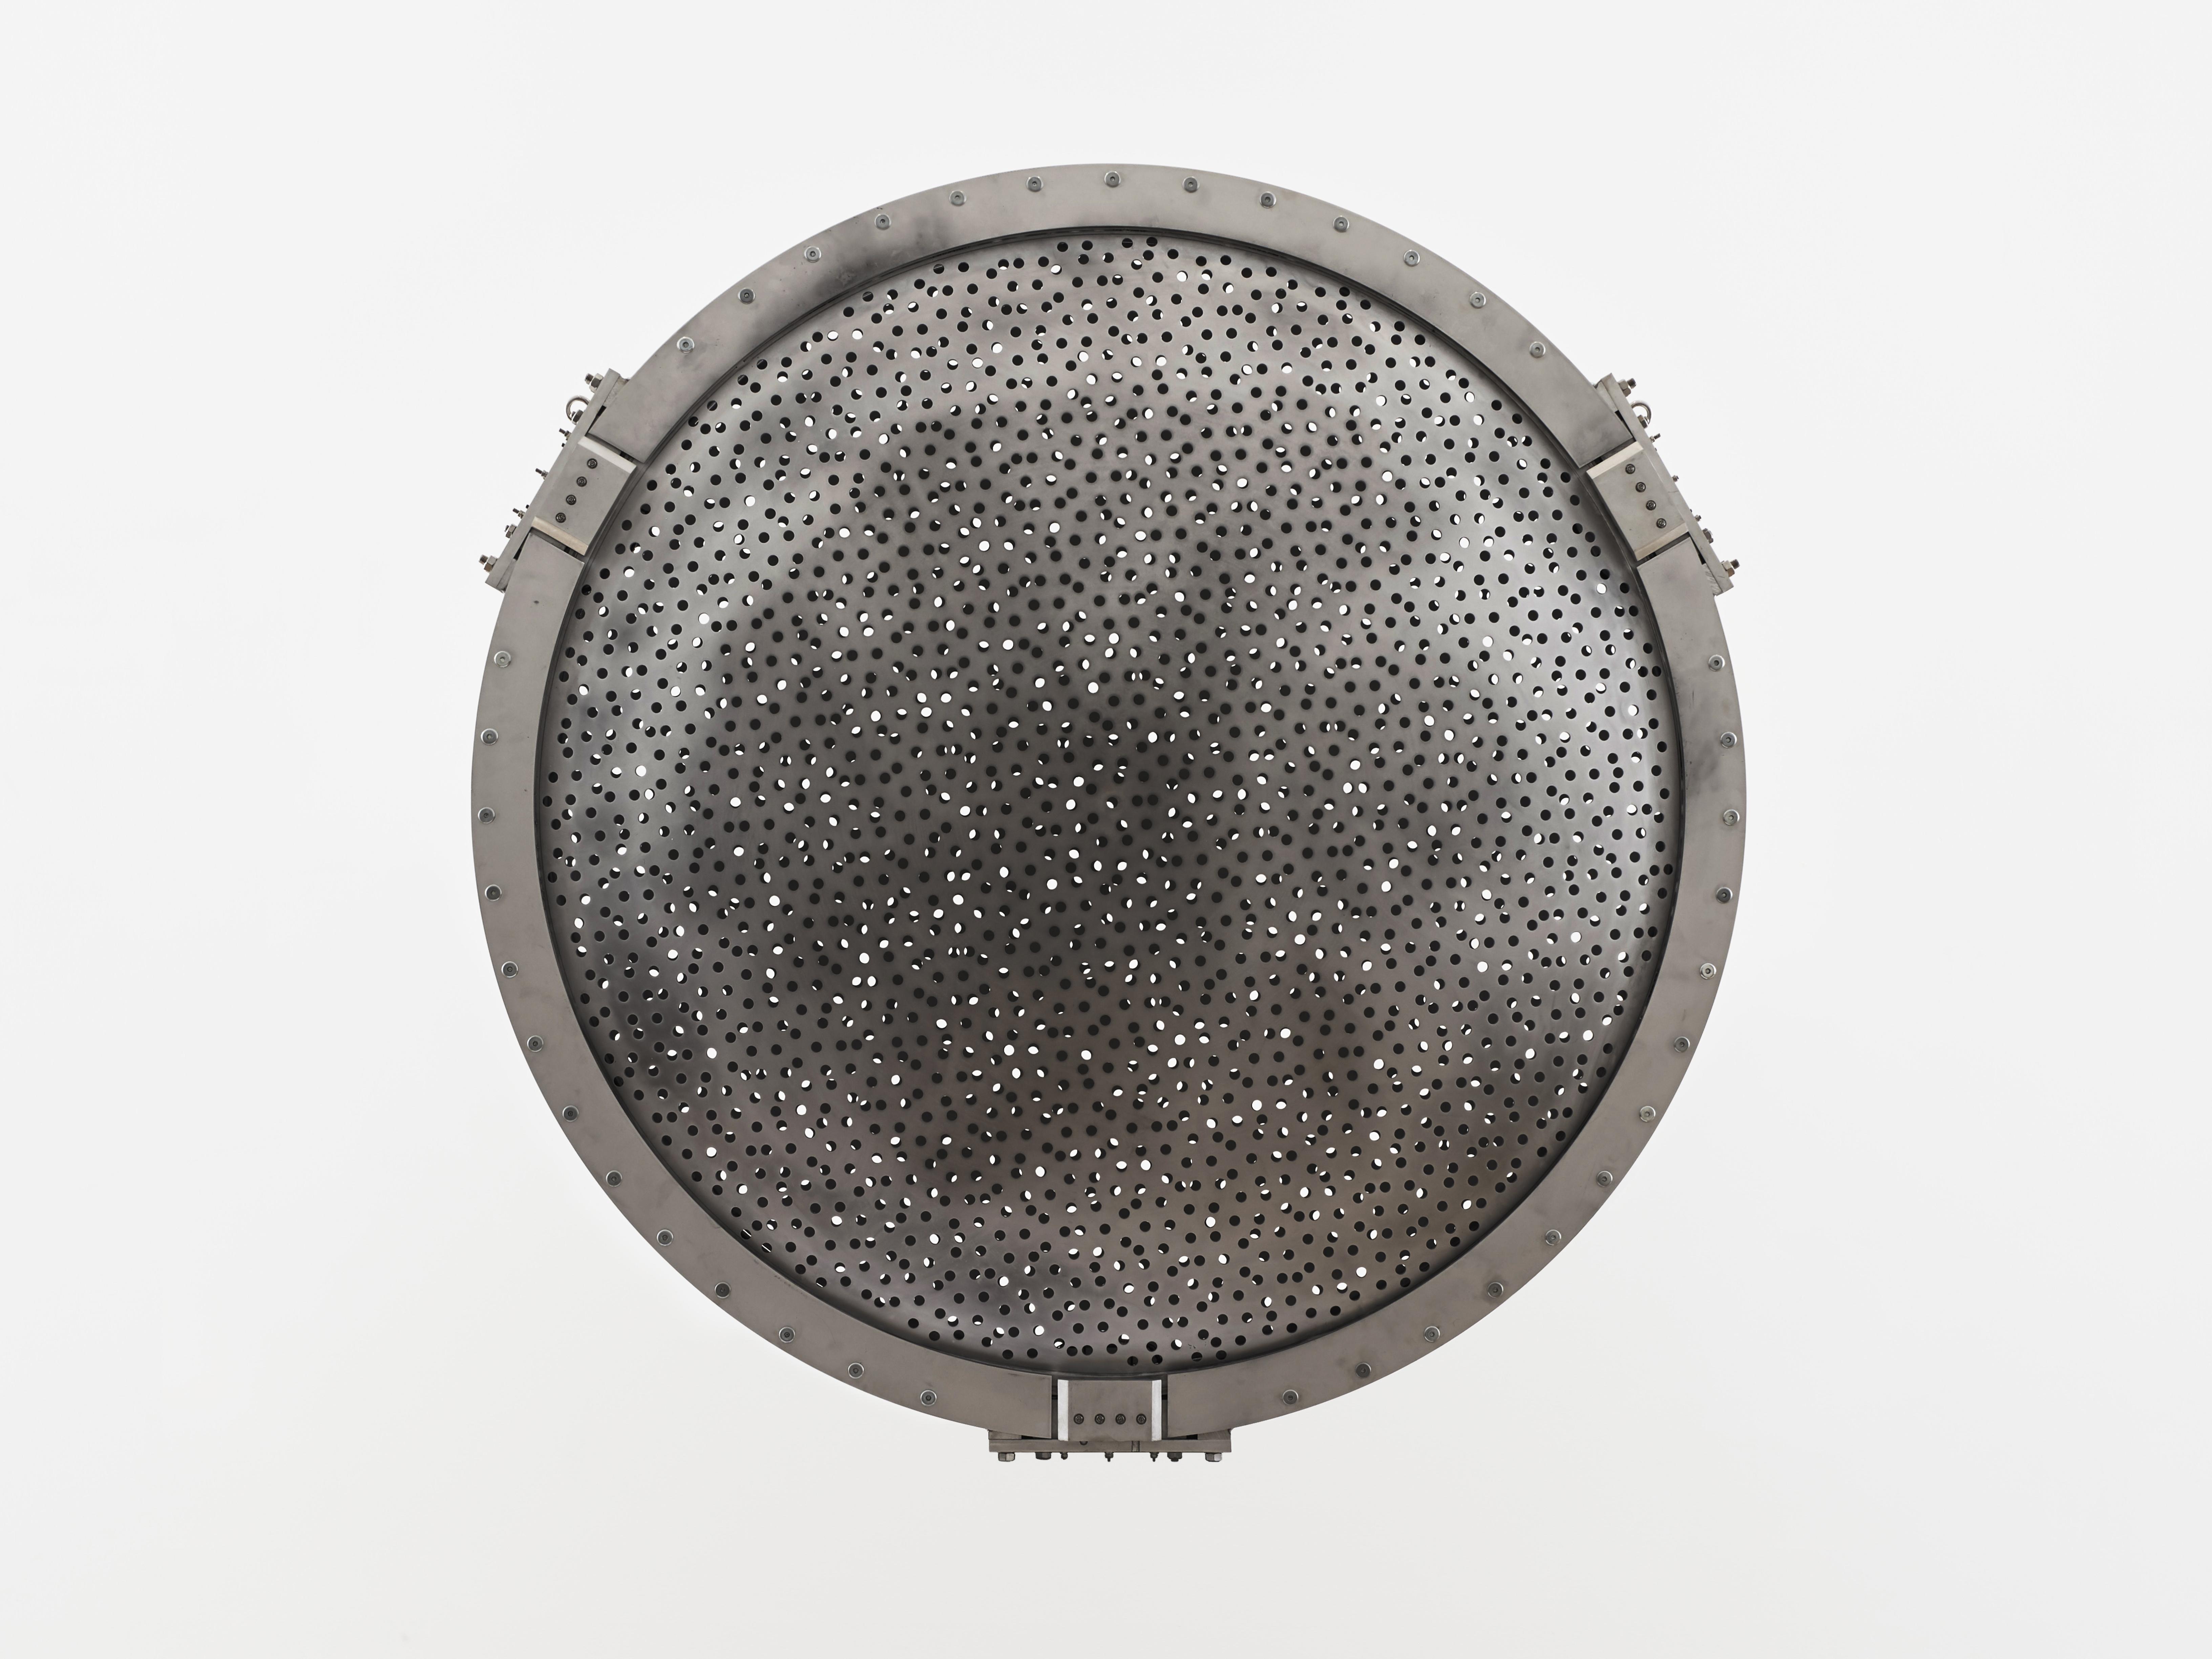 1, Conrad Shawcross Kinetic, Speckled